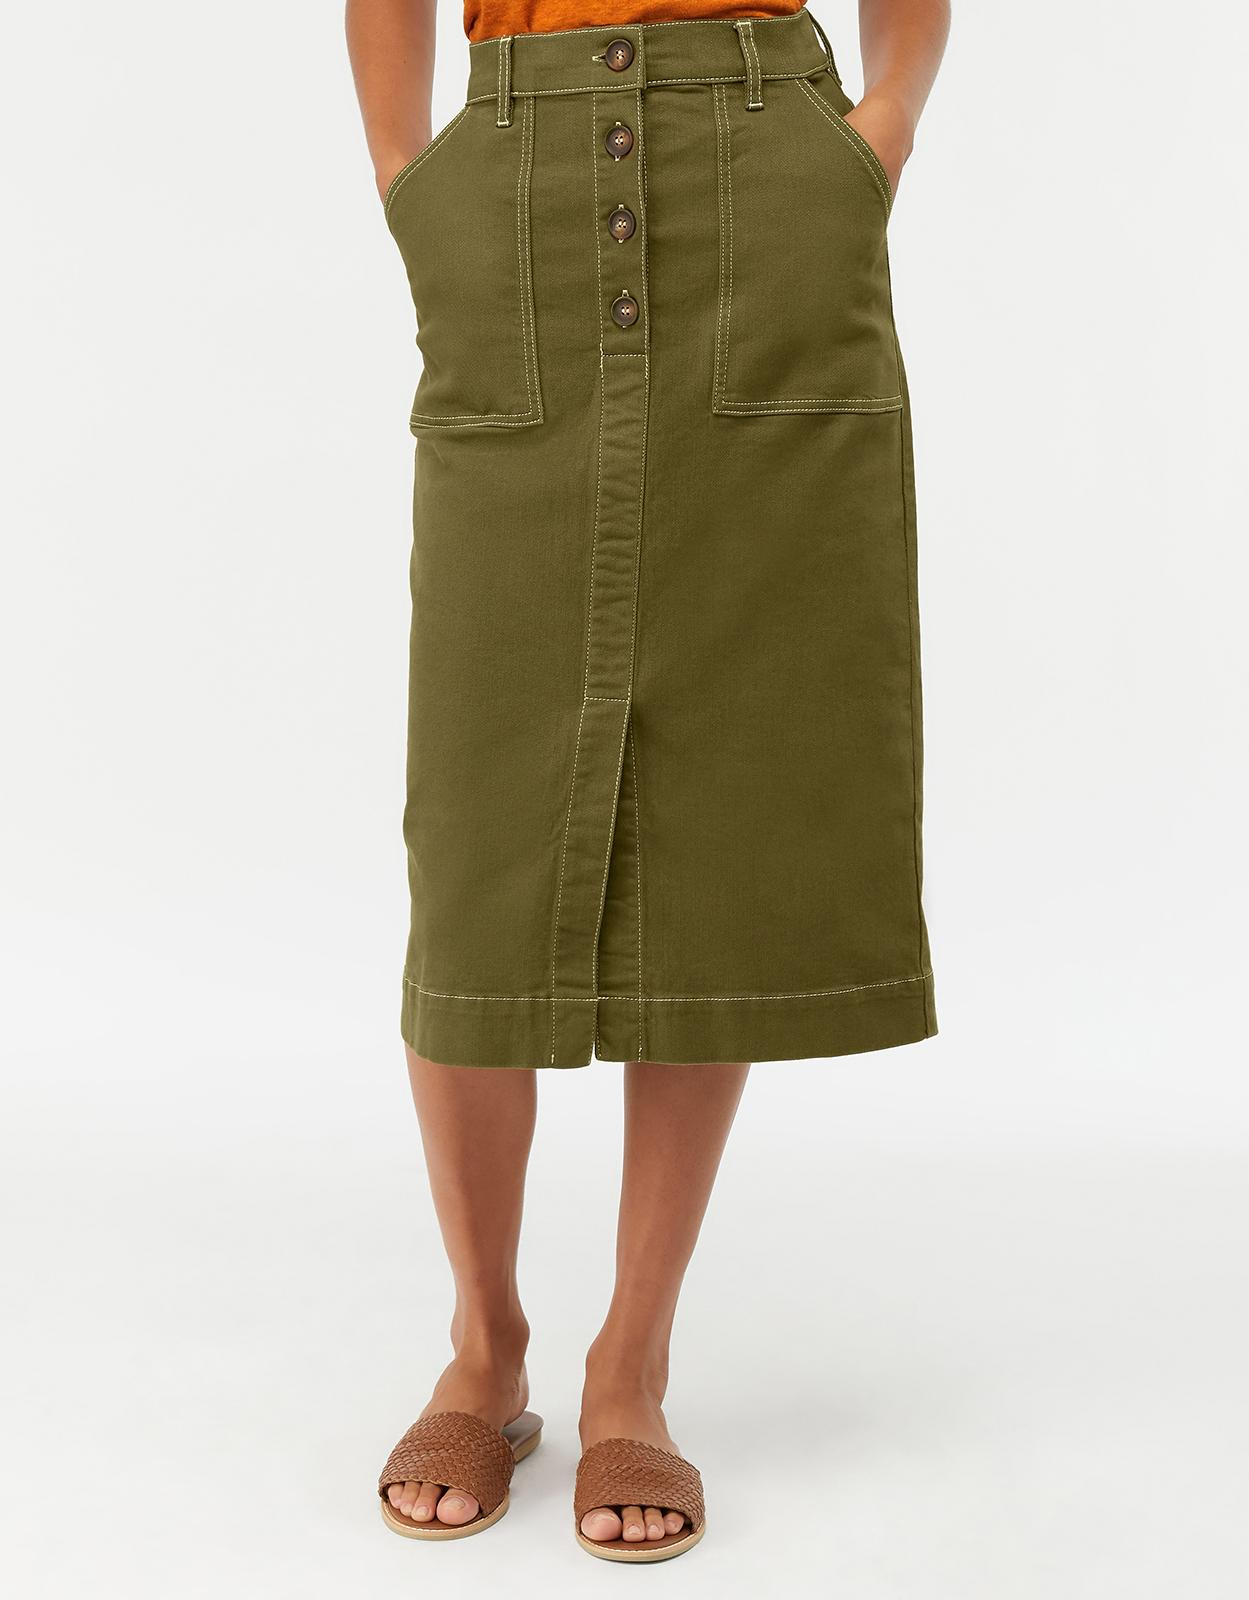 0fab398a85 Monsoon Ania Long Denim Skirt in Green - Lyst